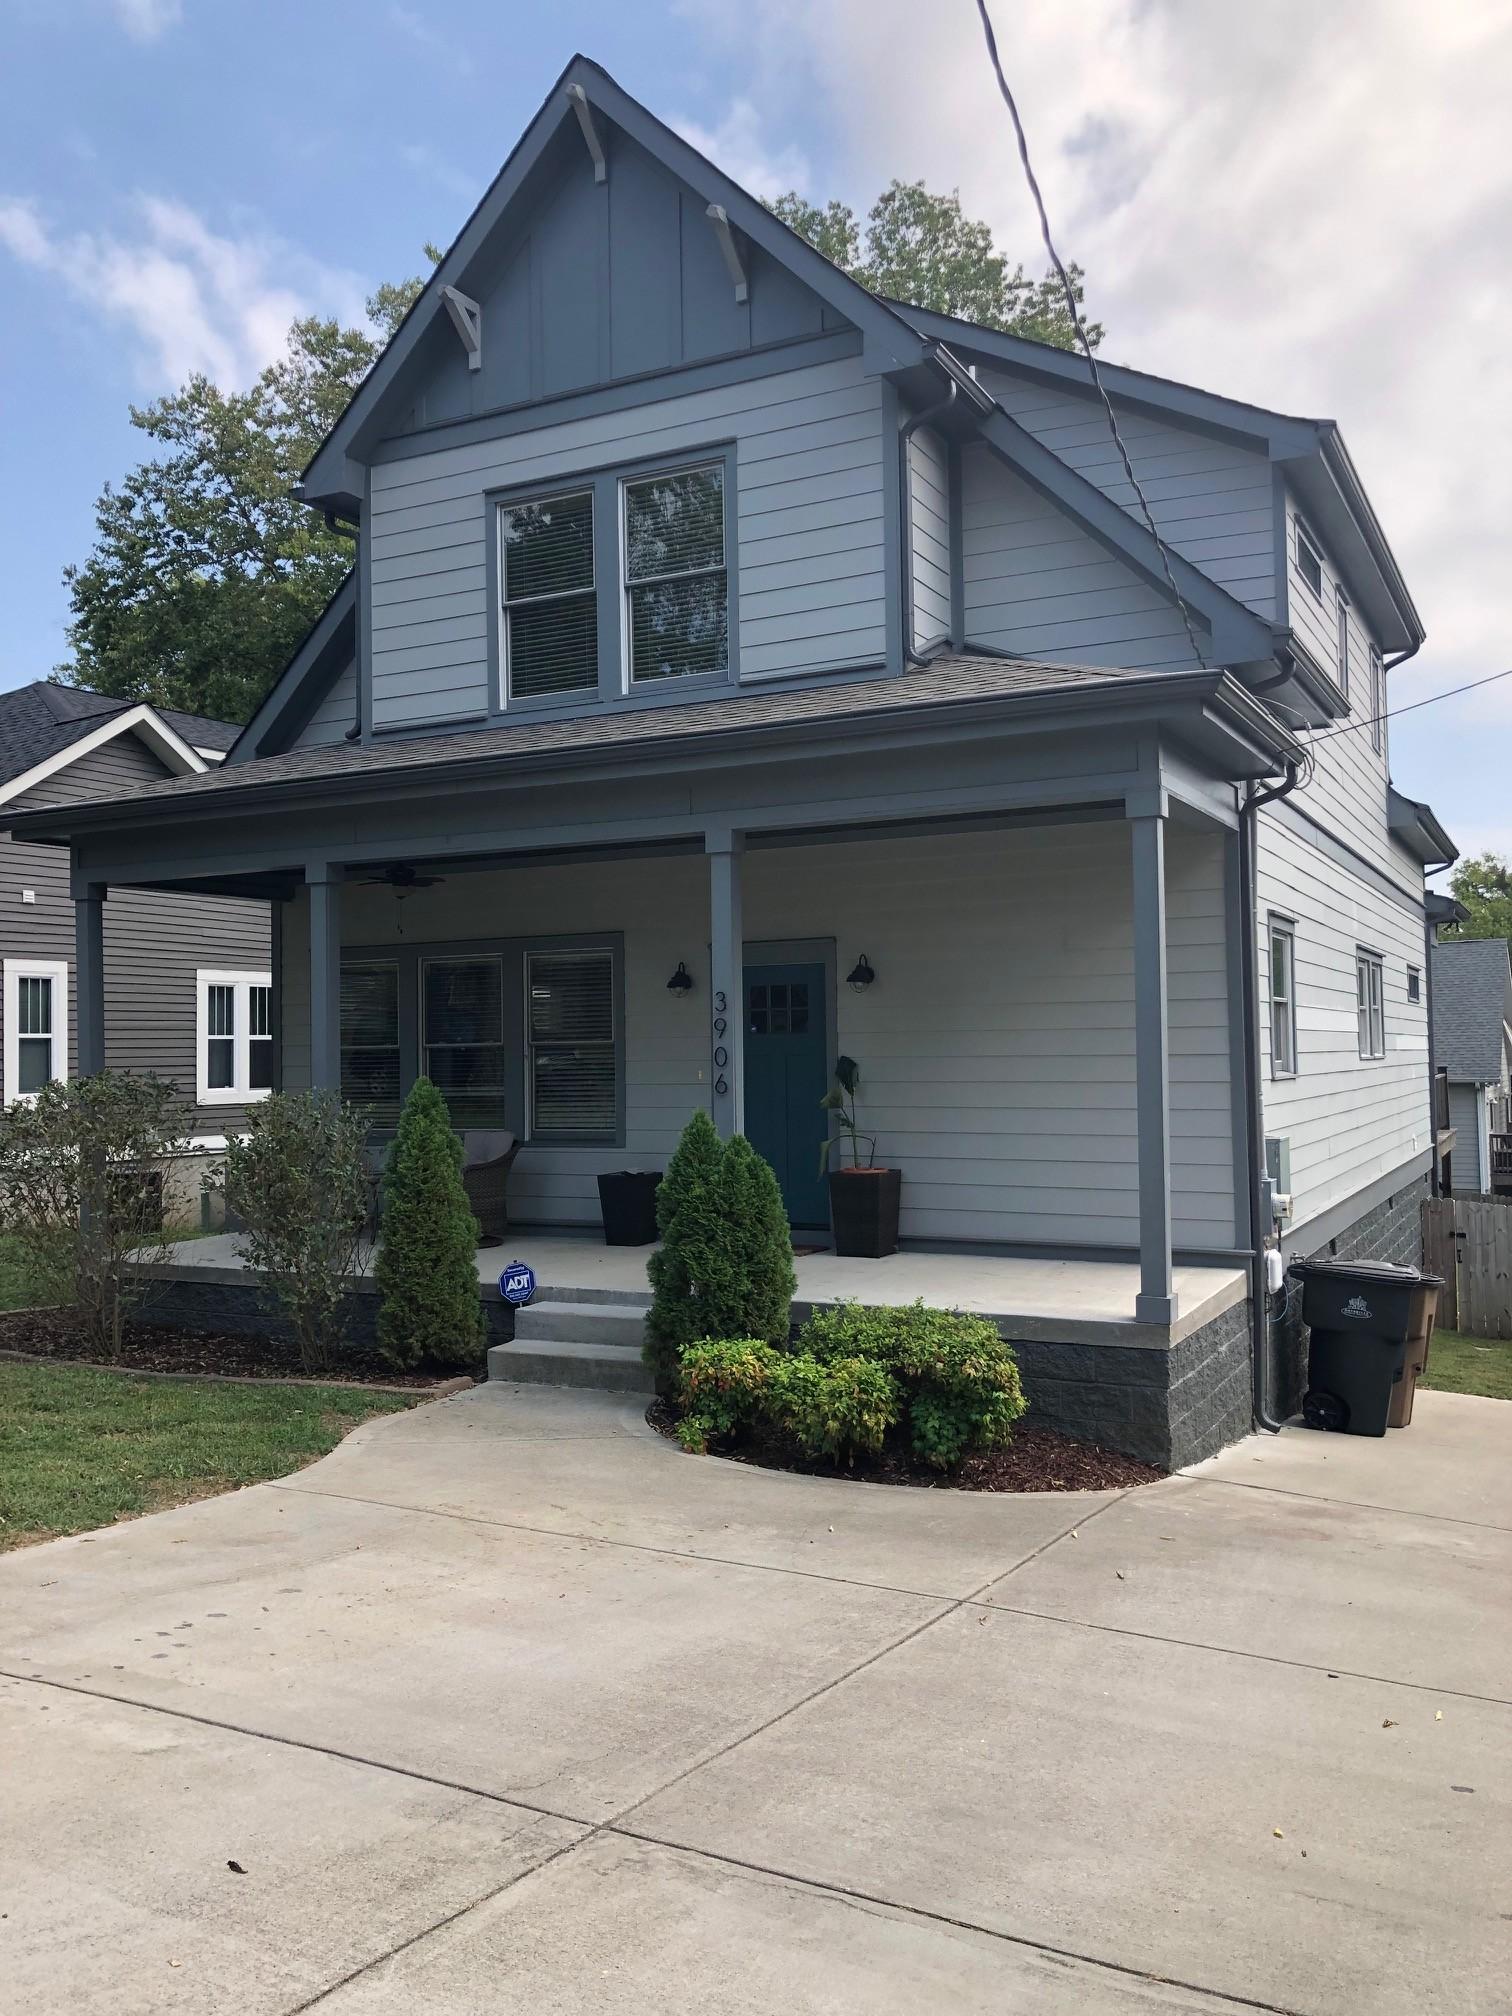 3906 Oxford St, Nashville, TN 37216 - Nashville, TN real estate listing